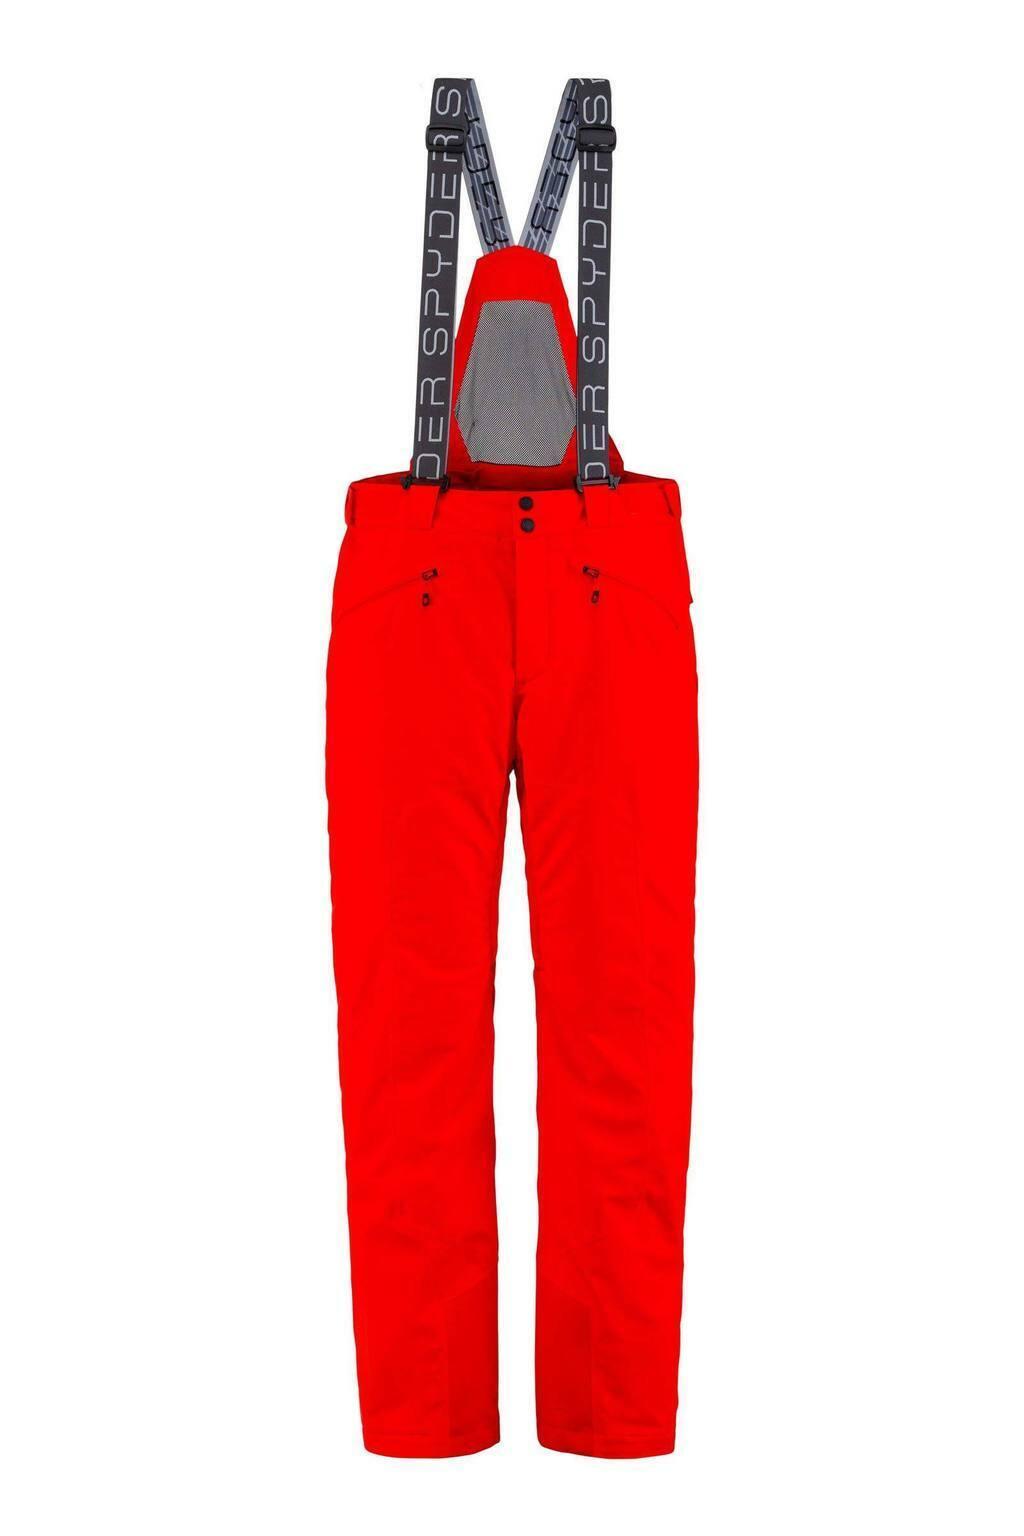 Spyder Sentinel Gore-Tex Ski Pant - Men's - Volcano - X-Larg